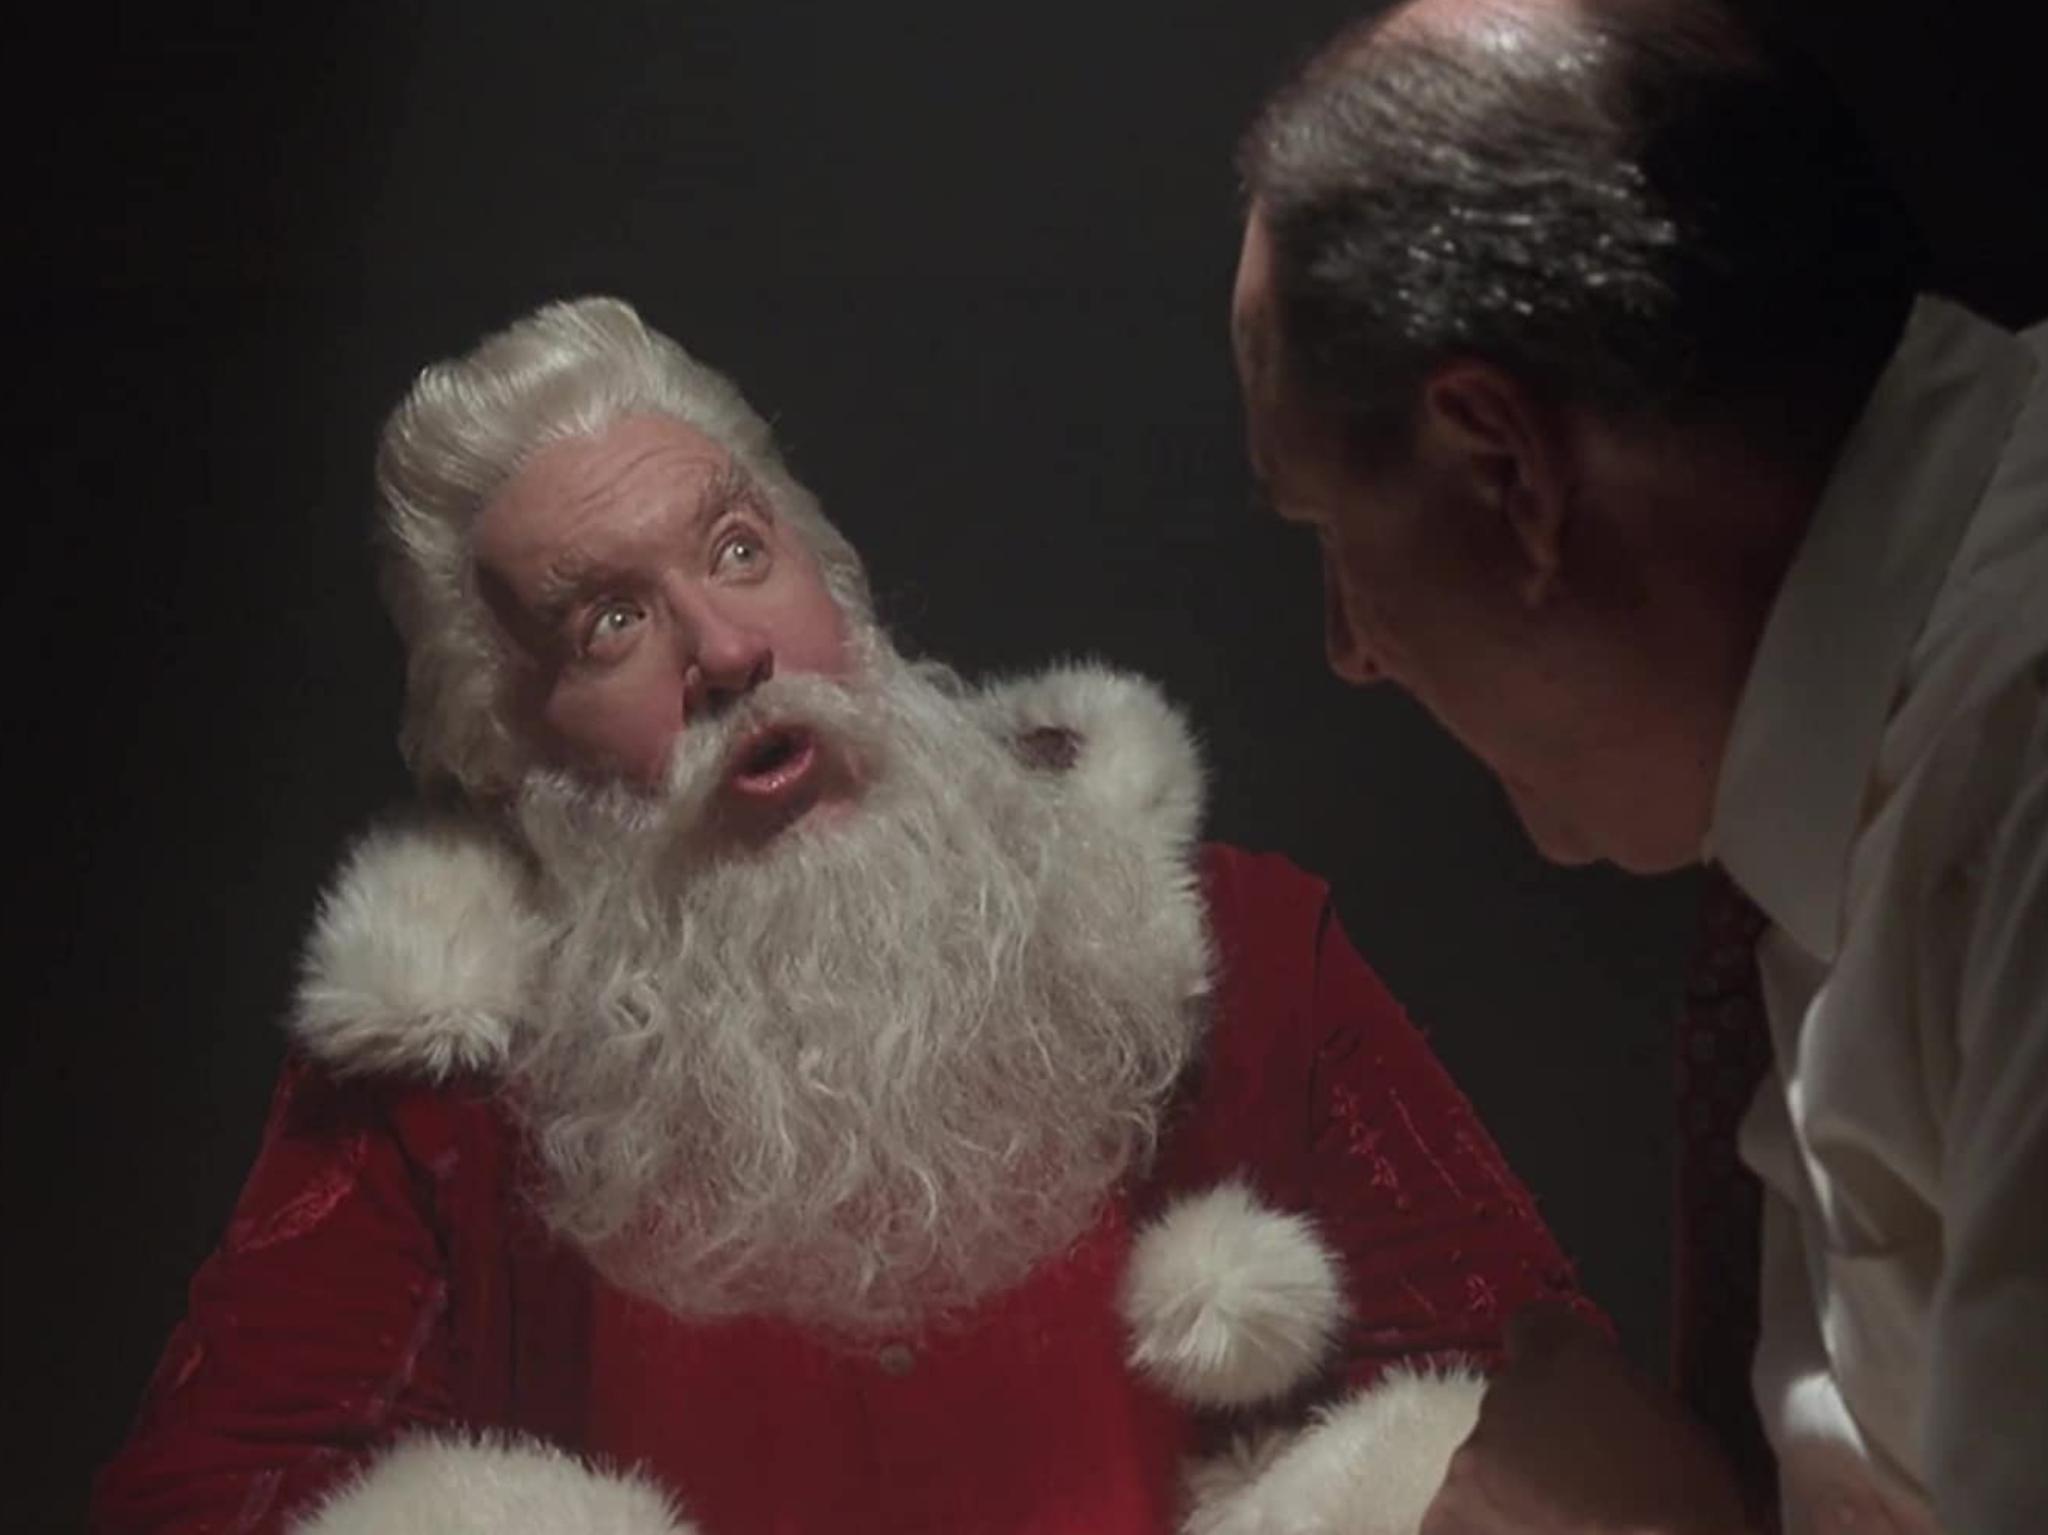 Santa Cláusula, película navideña protagonizada por Tim Allen